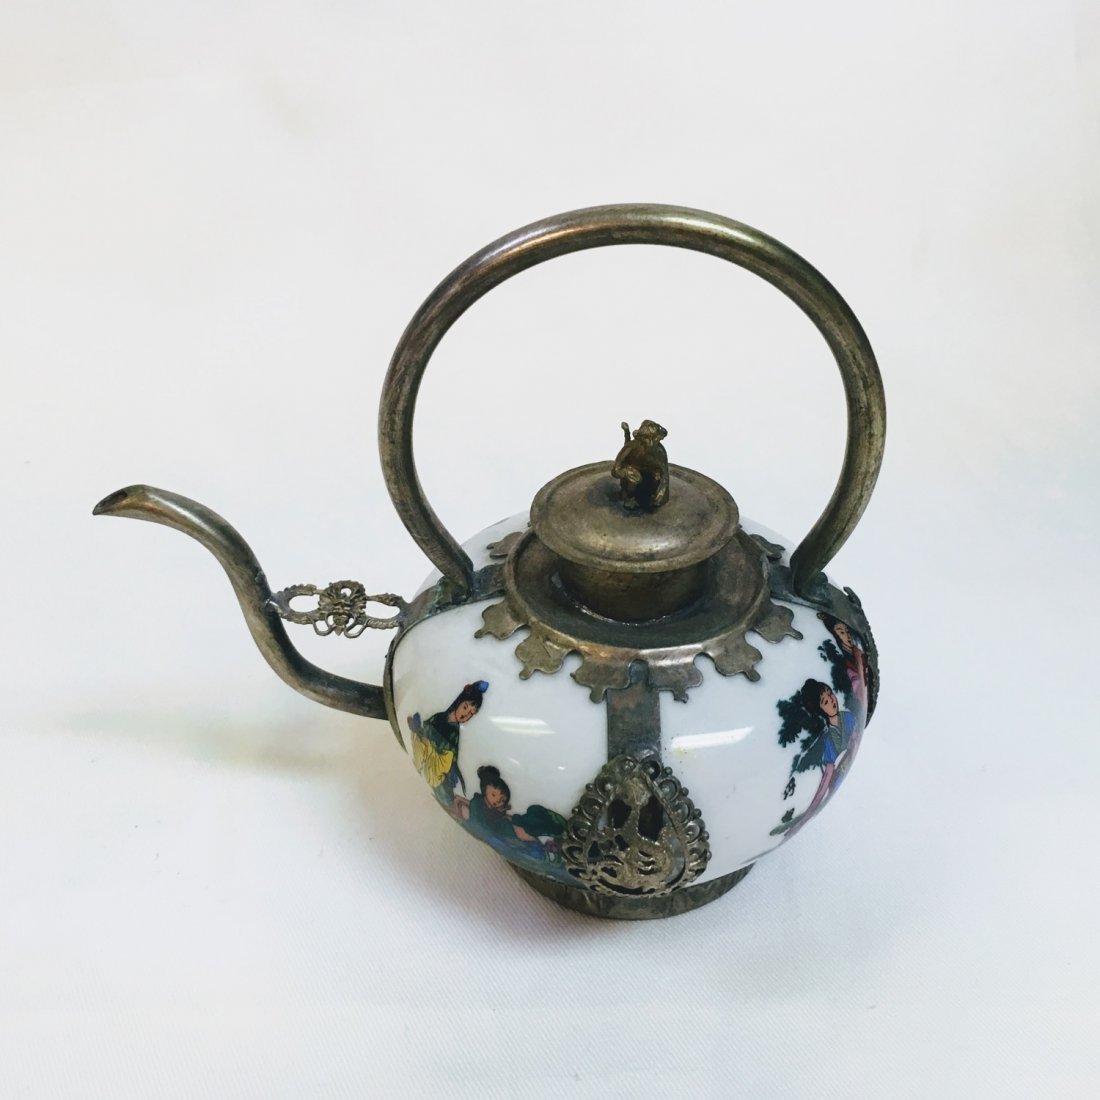 Chinese Vintage Porcelain & Metal Teapot - 5